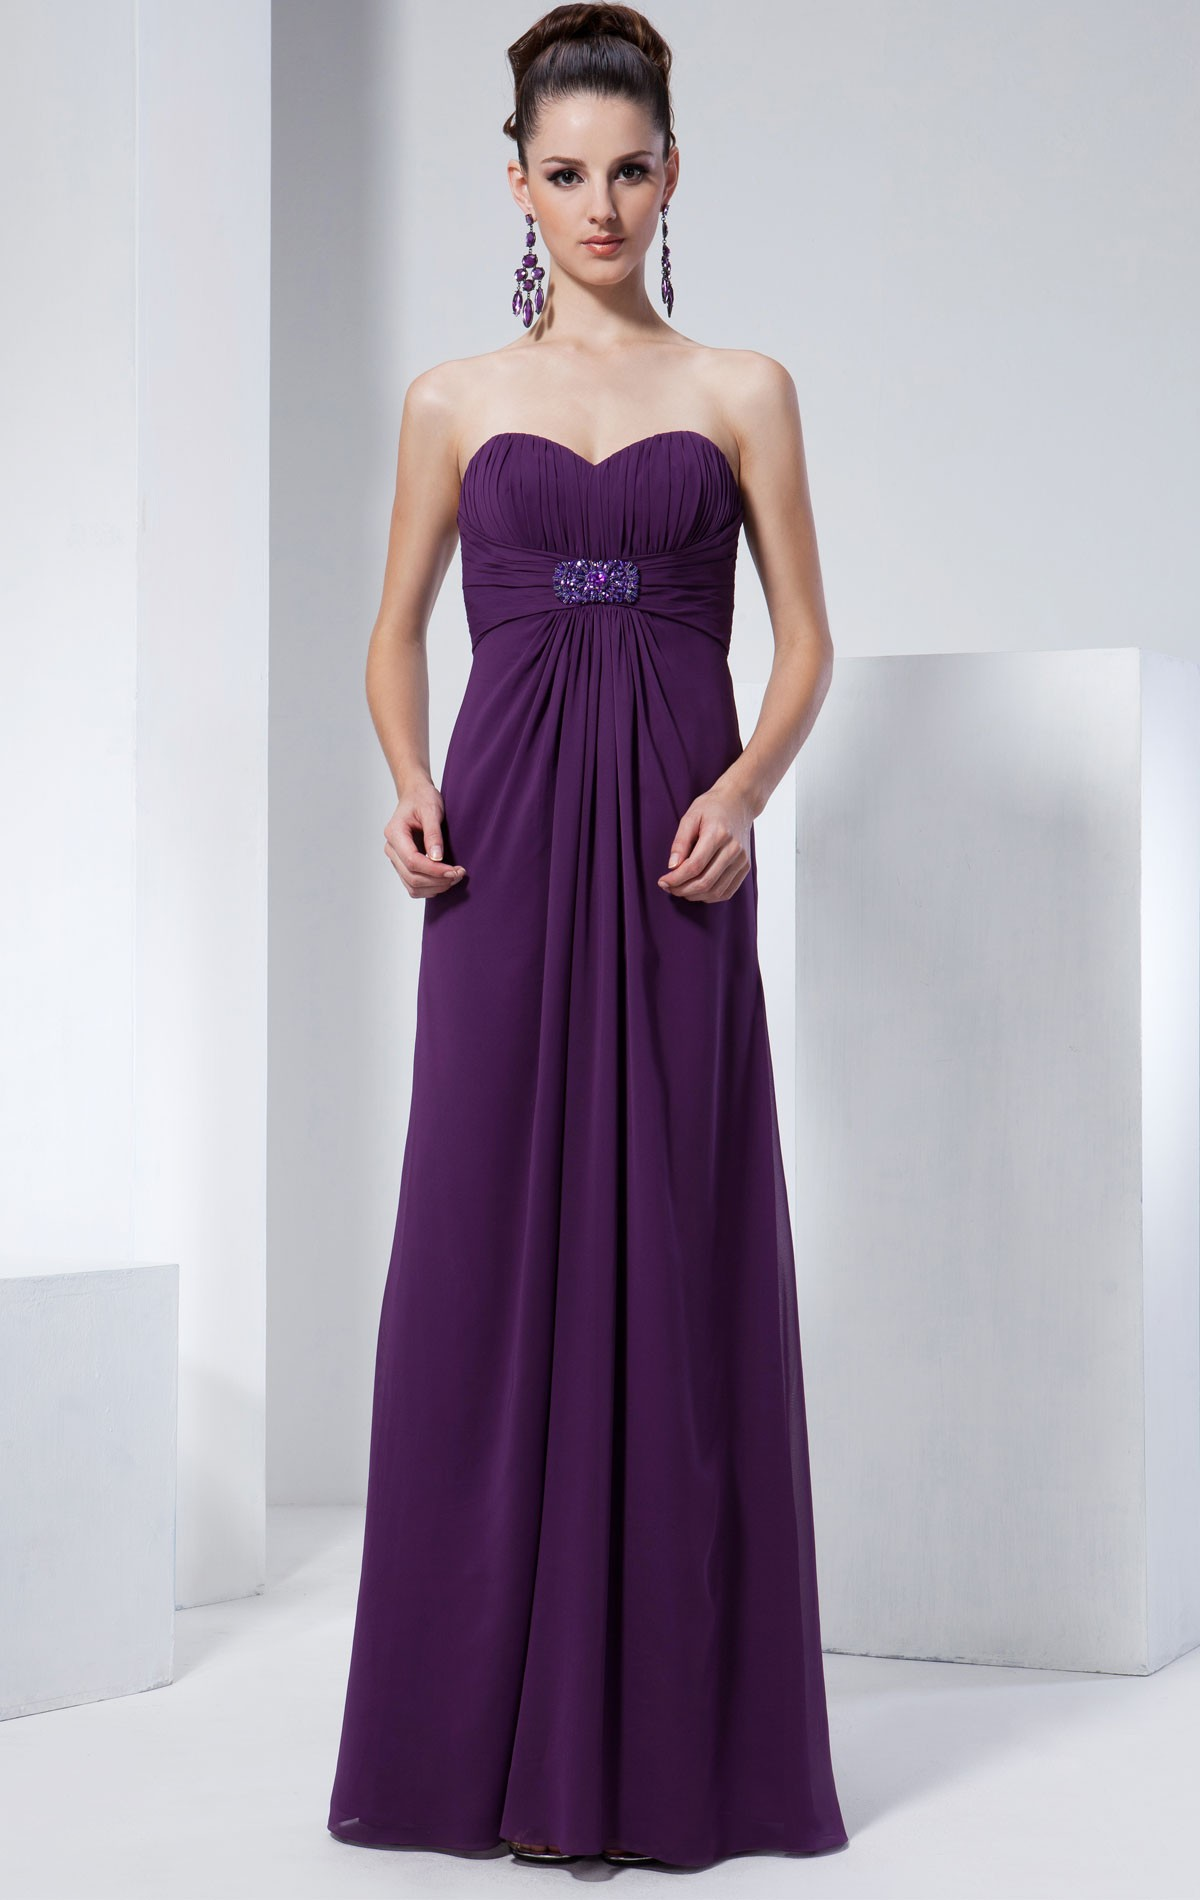 Venus bridesmaid dress bm1578 blessings of brighton bmd1578 bridesmaid dress bm1578 full length cadbury purple chiffon empire line bridesmaid dress with ombrellifo Gallery